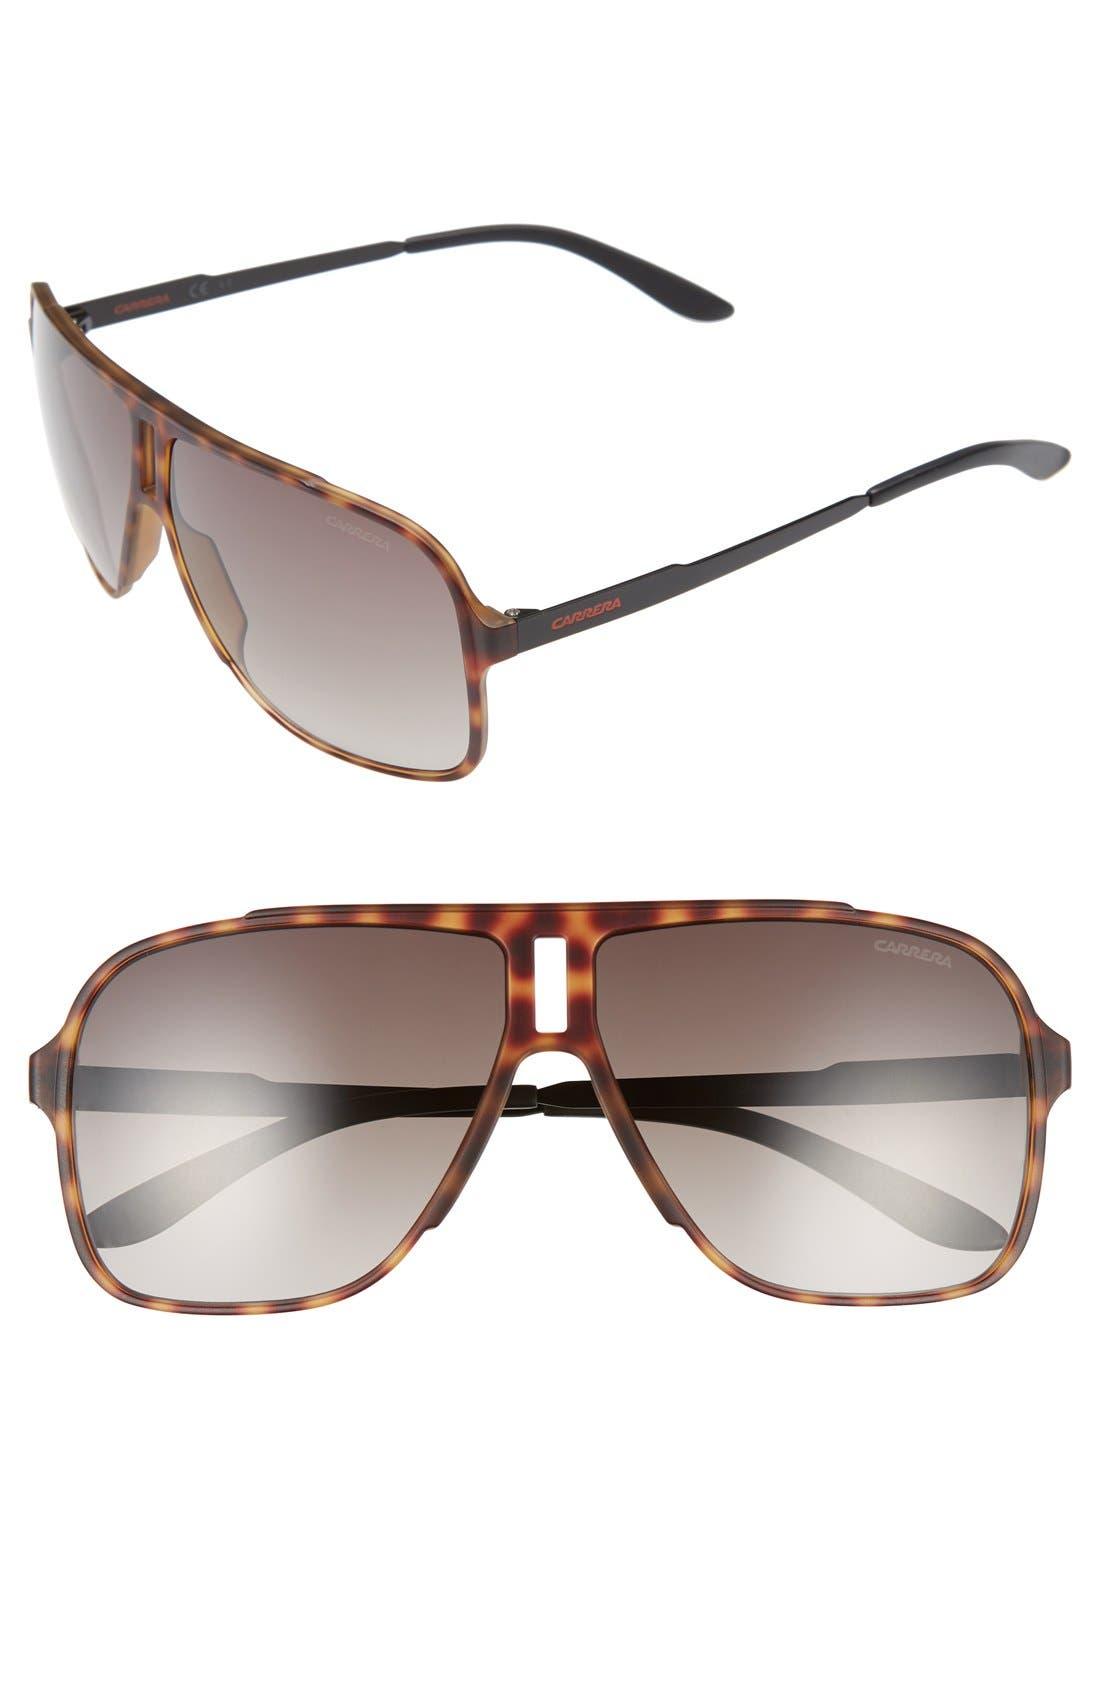 61mm Sunglasses,                             Main thumbnail 1, color,                             210